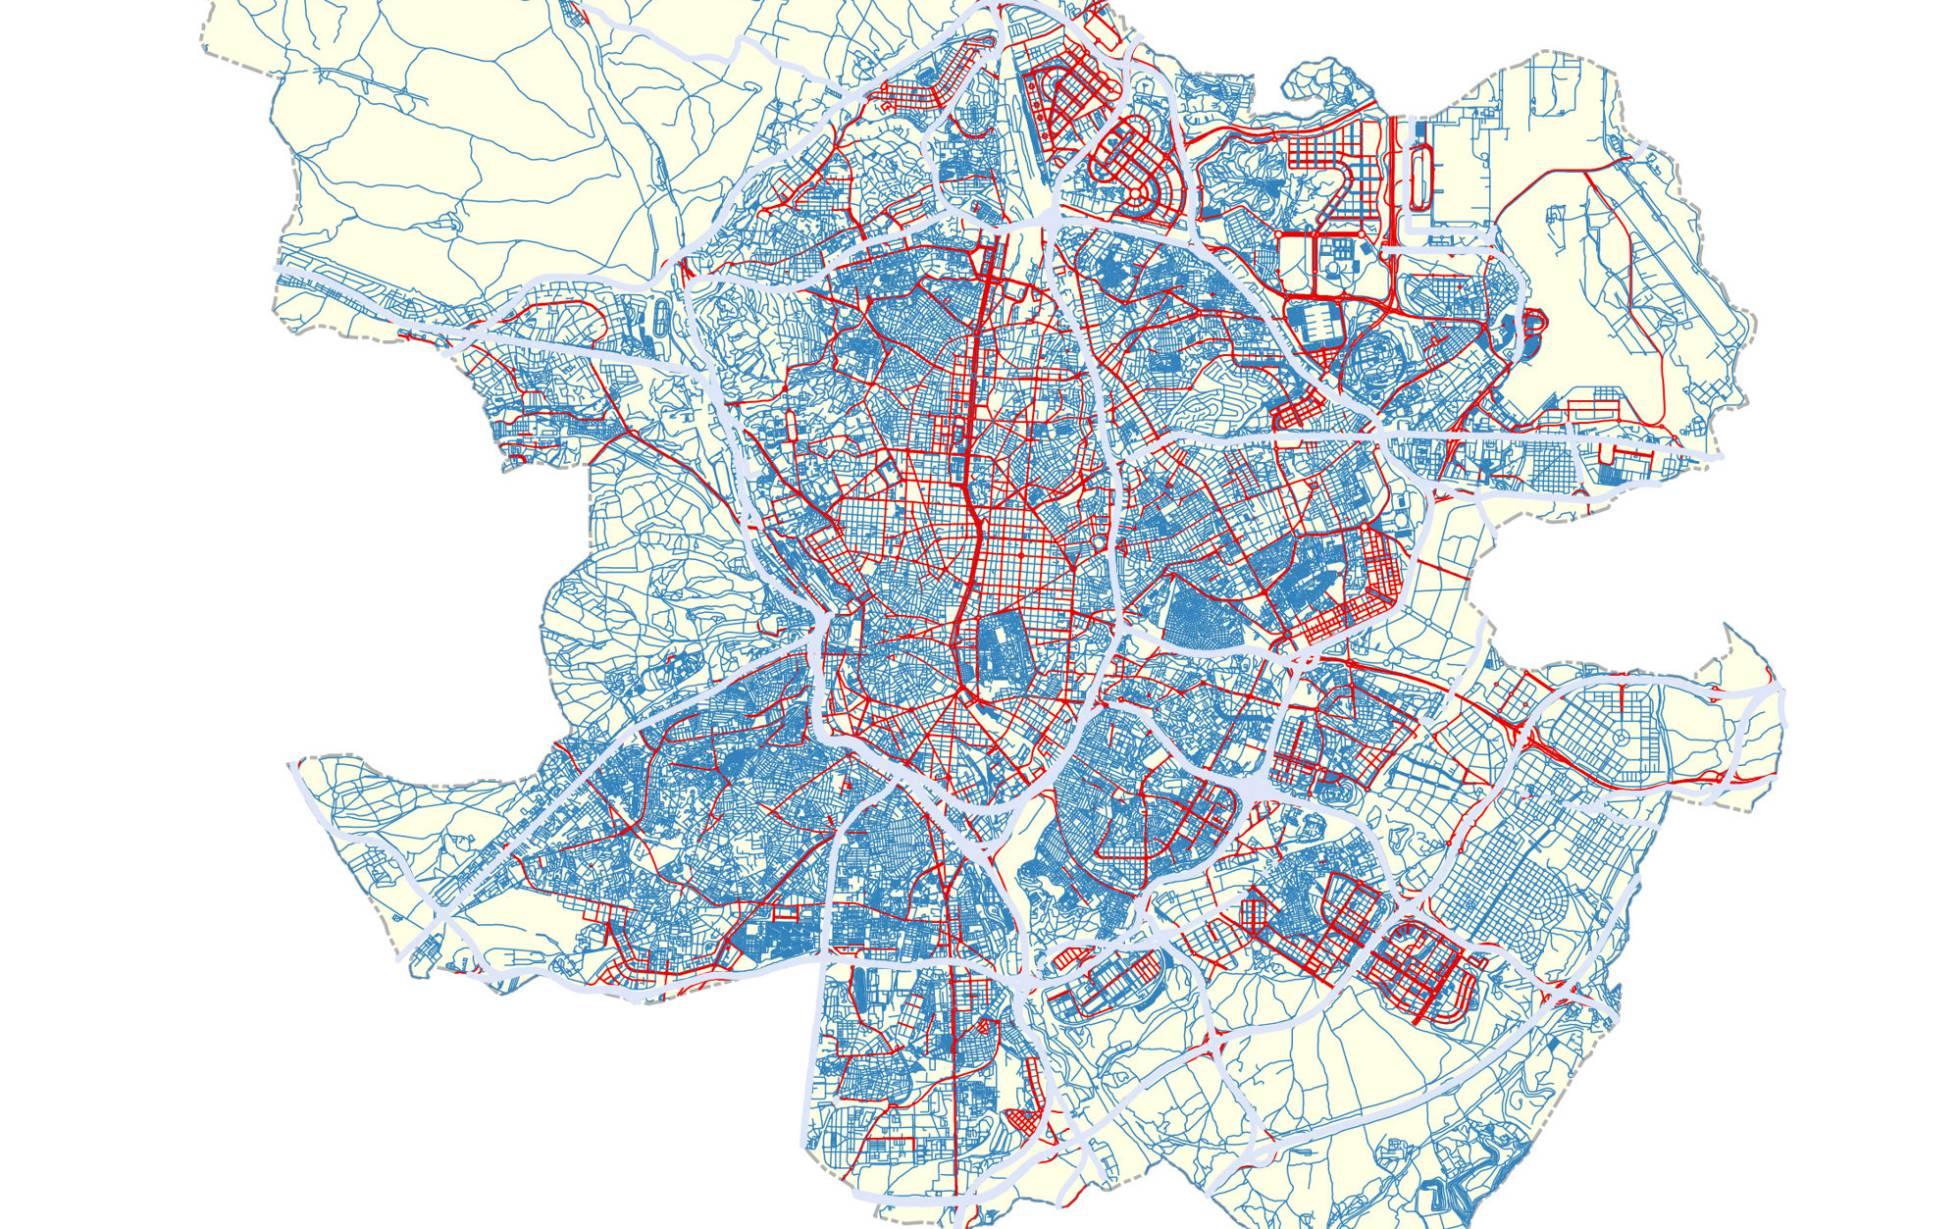 Estas Son Todas Las Calles De Madrid Que Estaran Limitadas A 30 Km